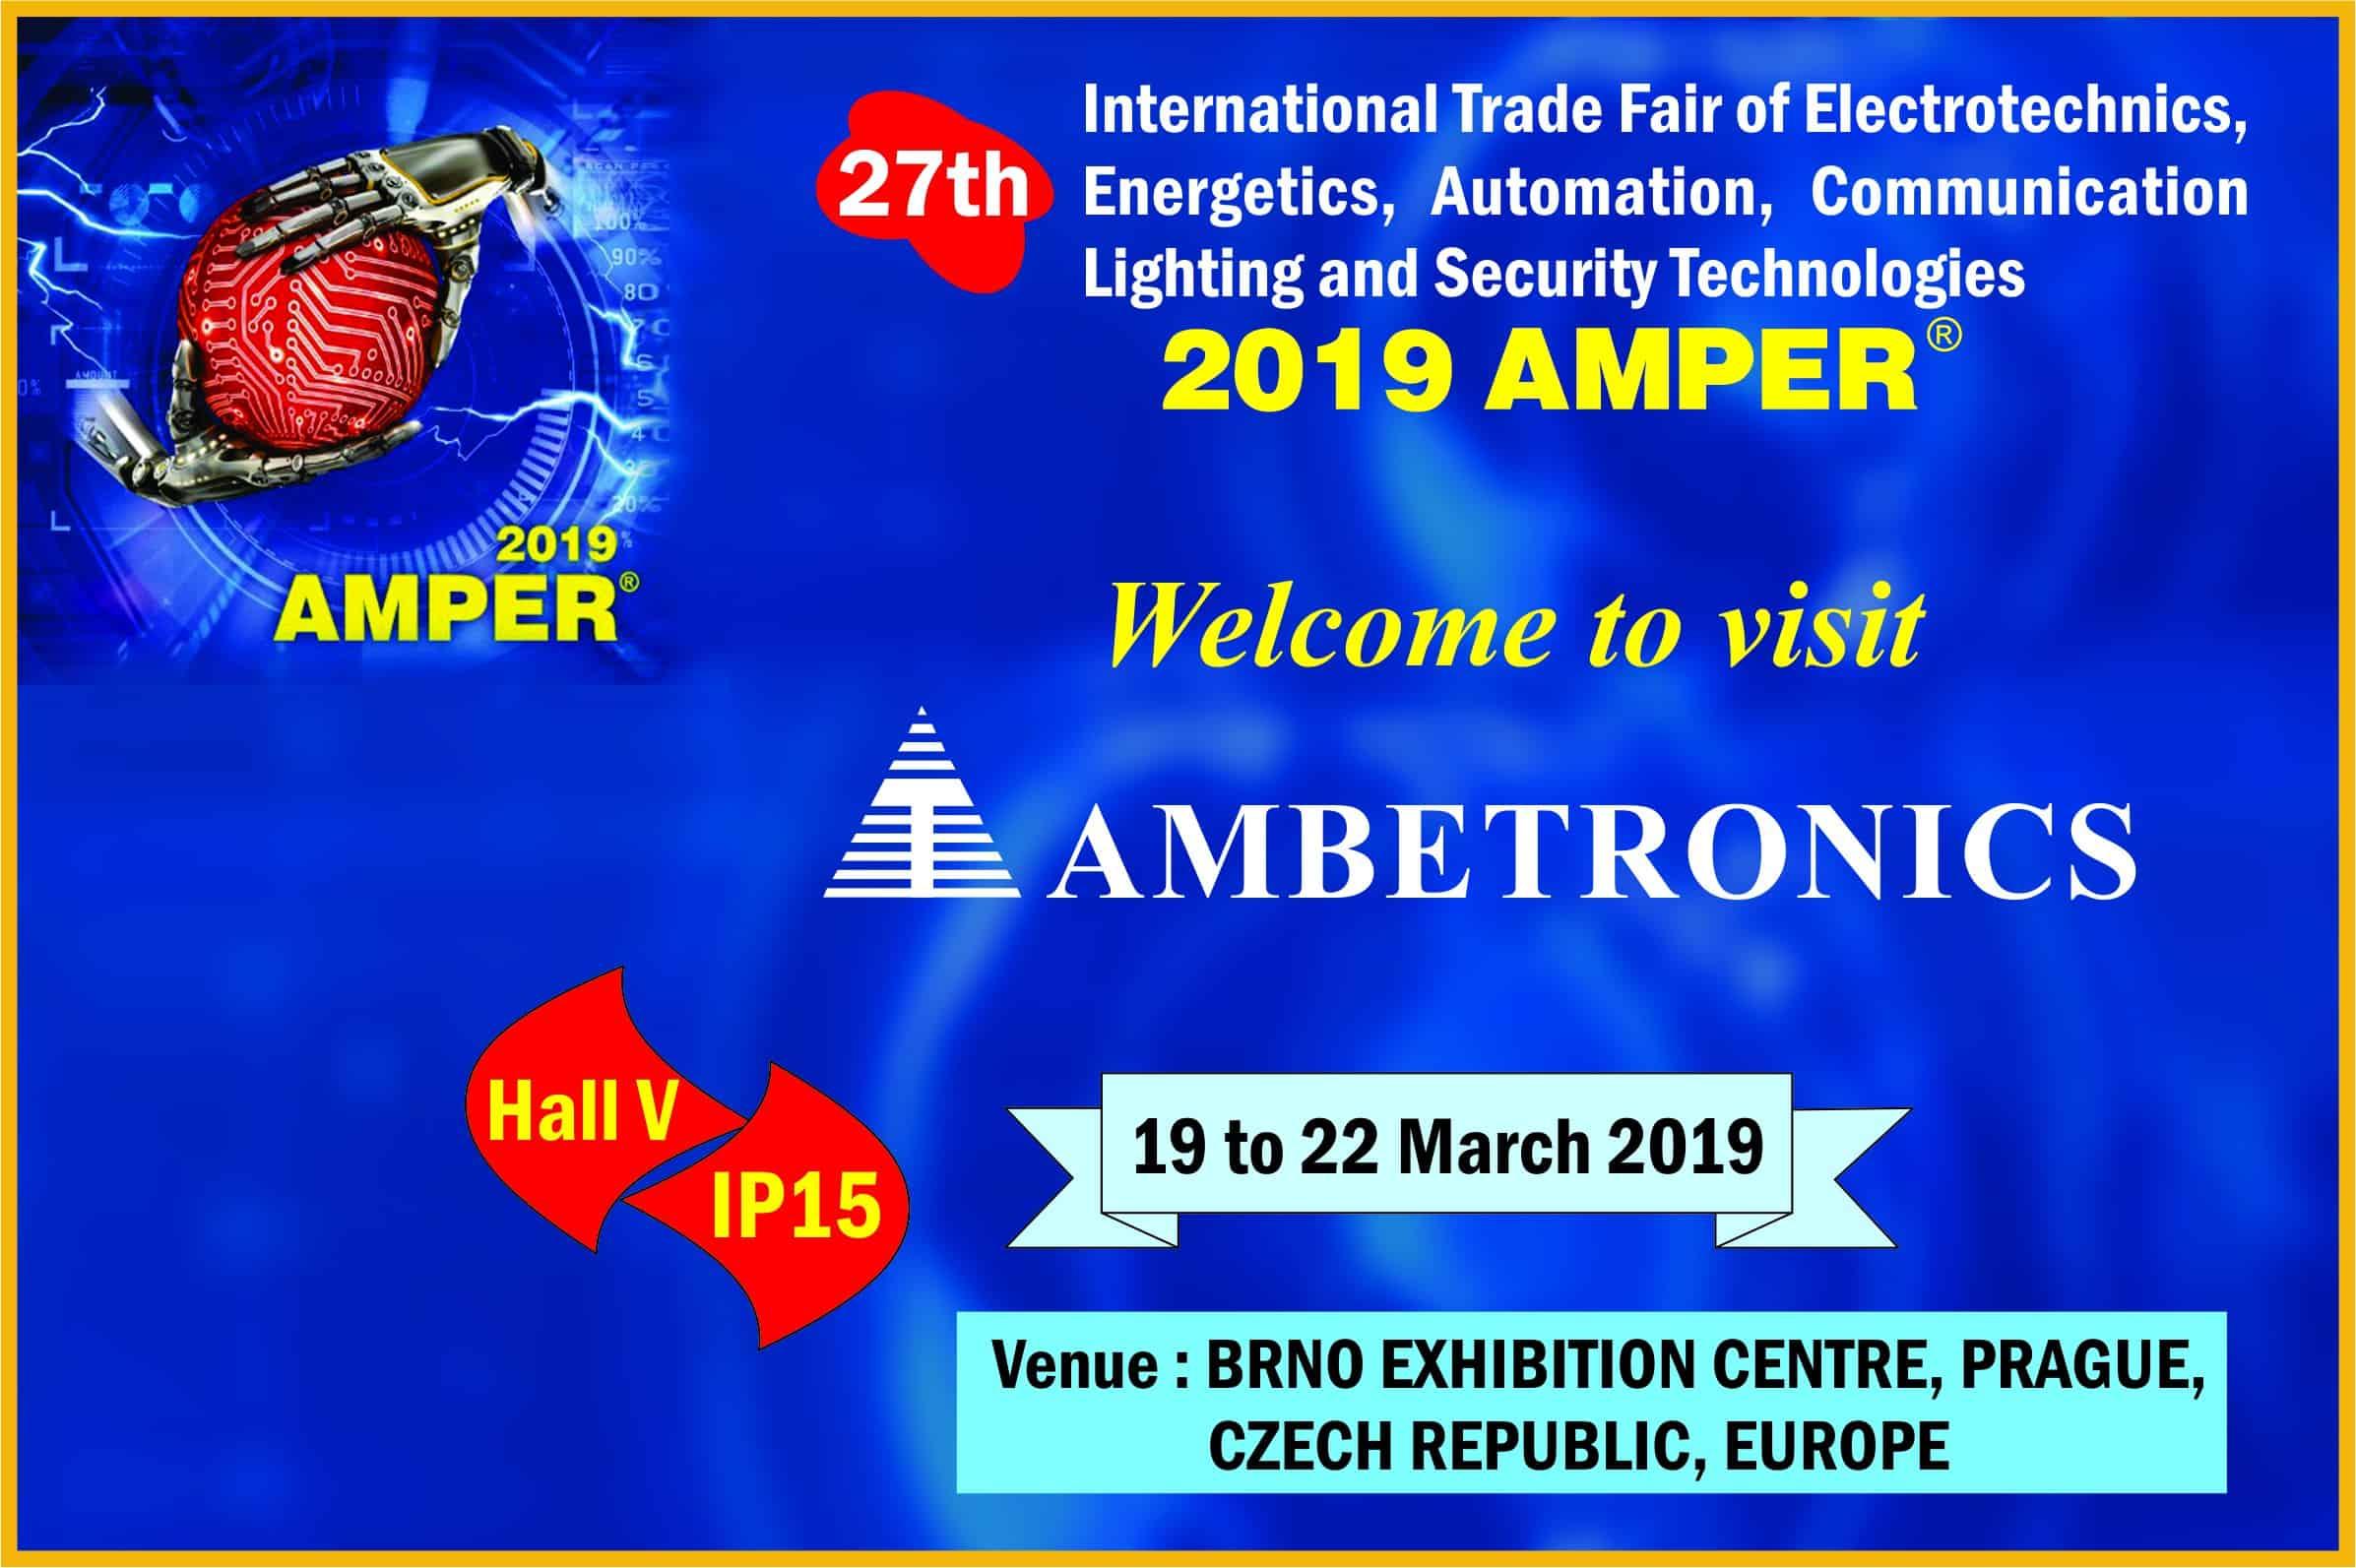 Invitation for 2019 AMPER Exhibition, at Prague, Czech, Europe